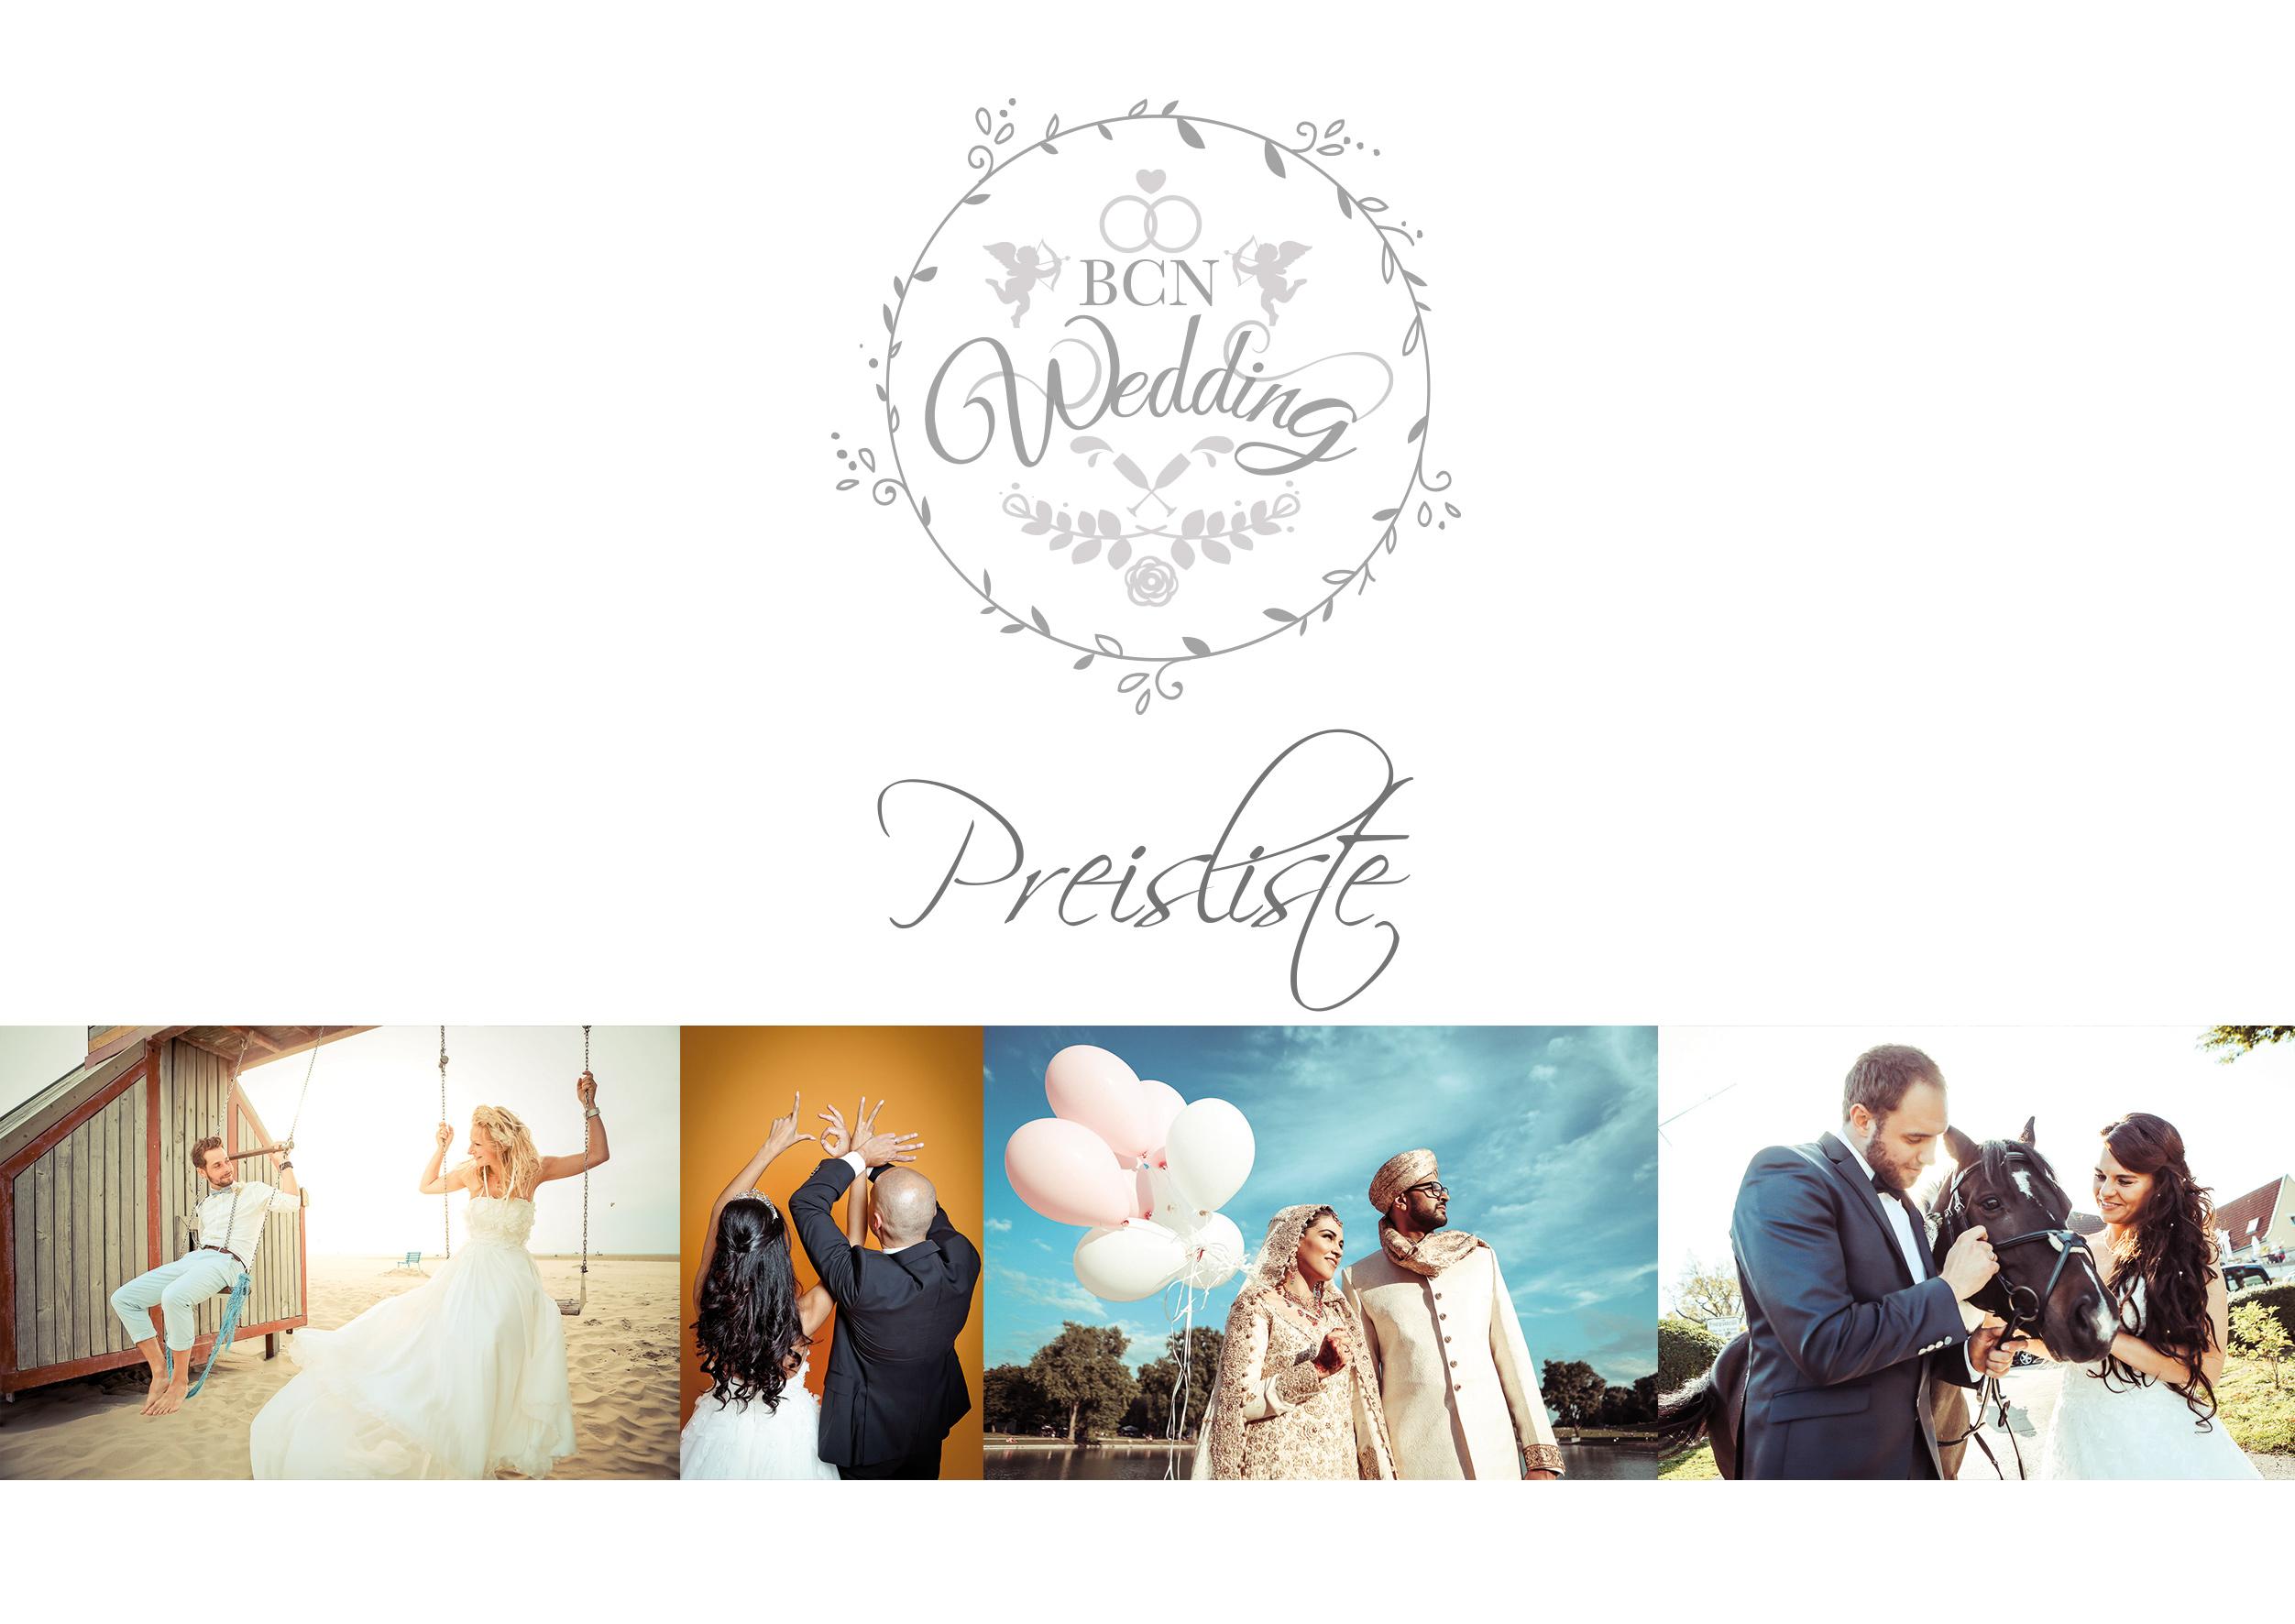 preise_bcn_wedding1